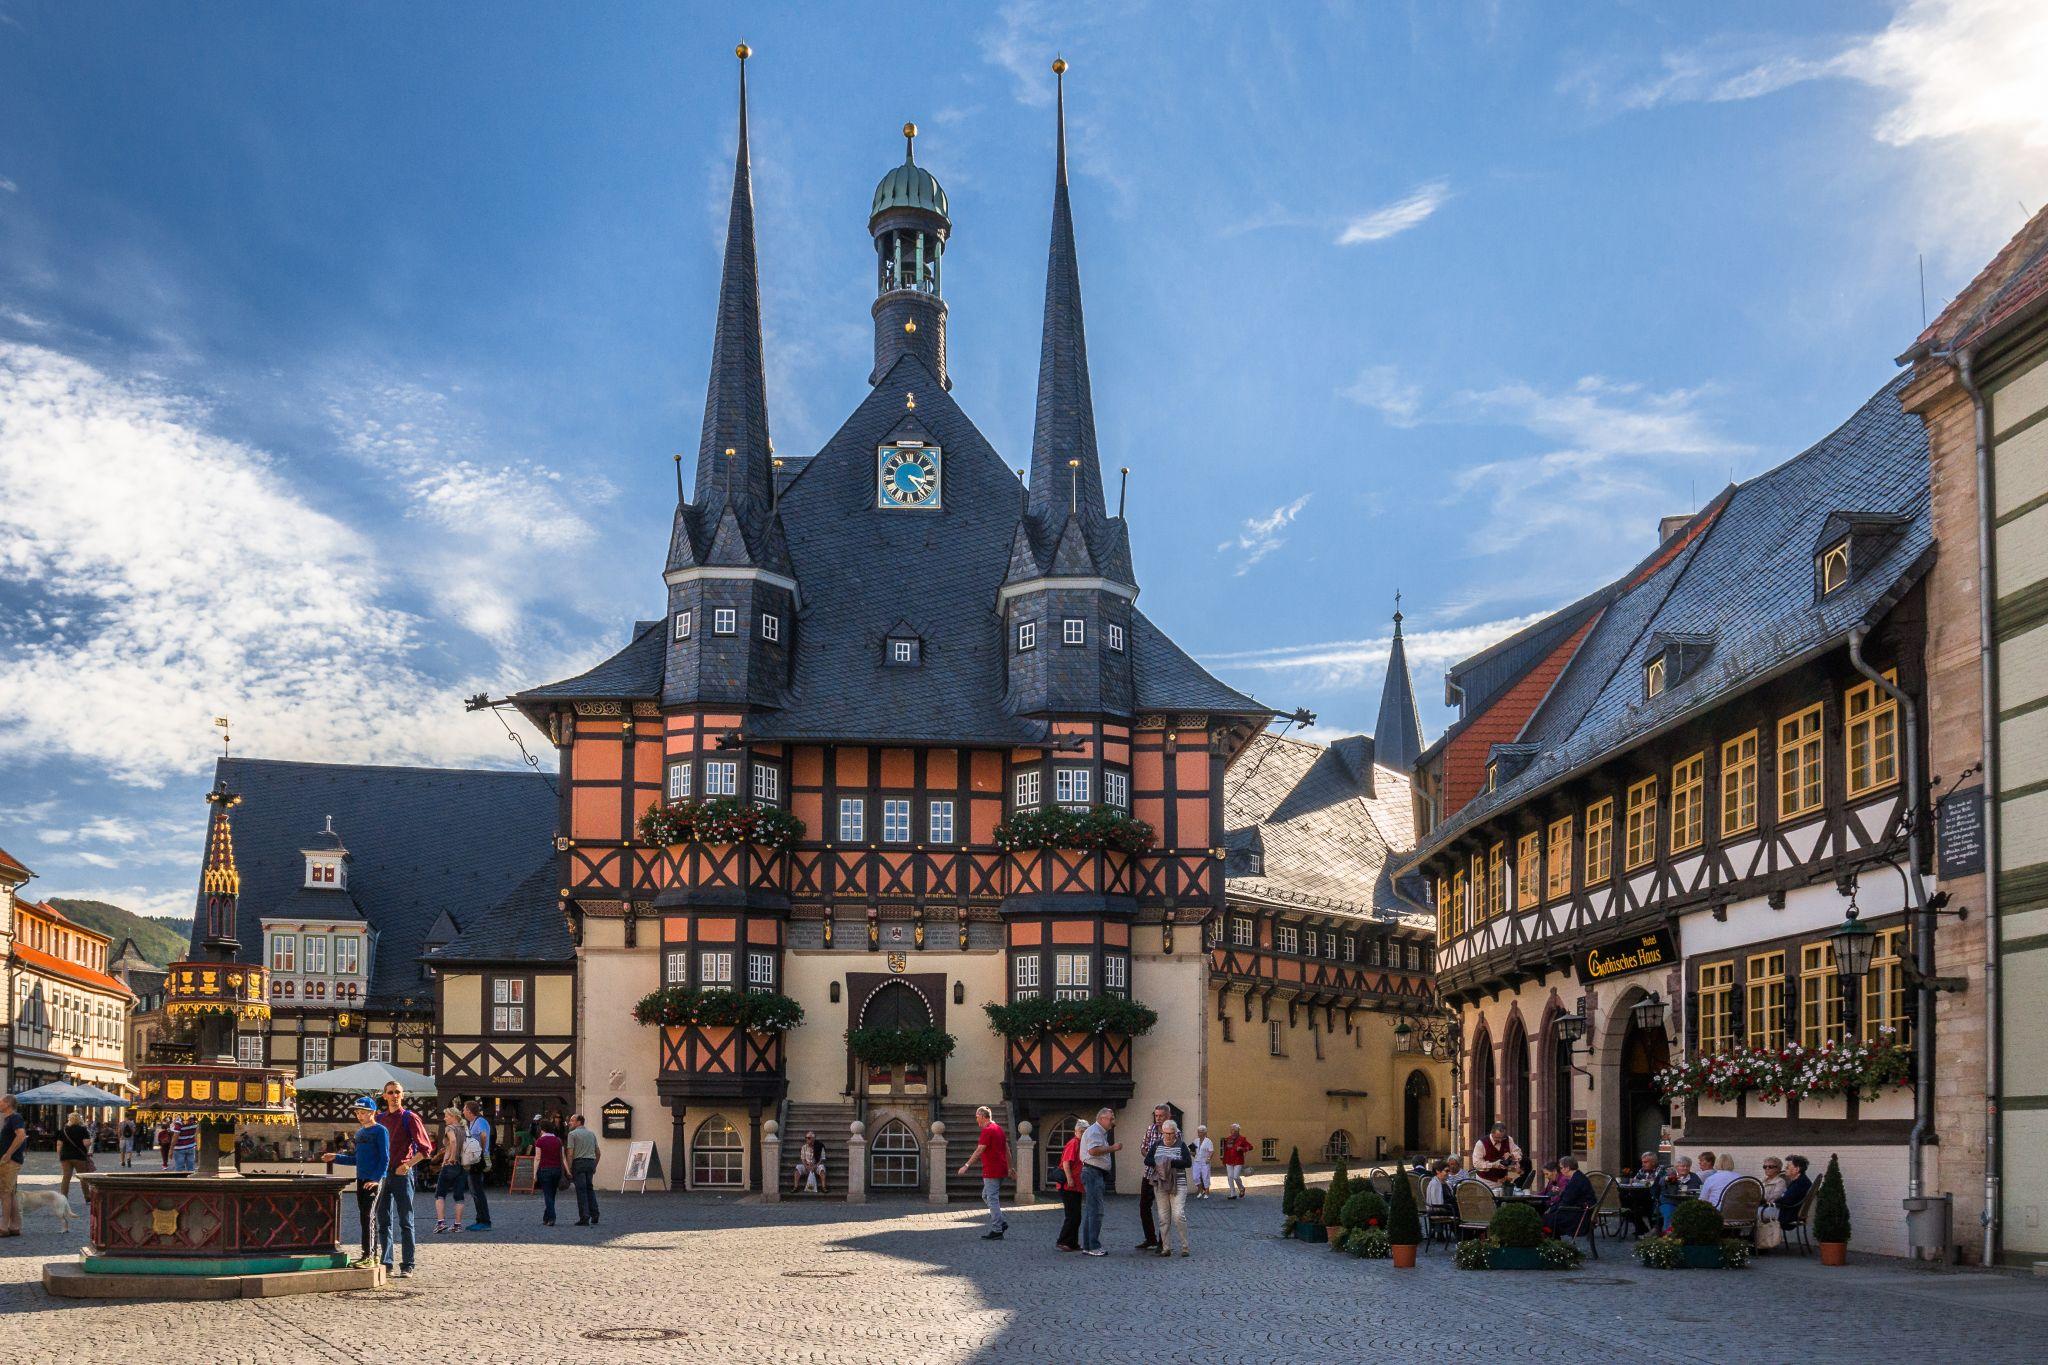 Rathaus Wernigerode, Germany